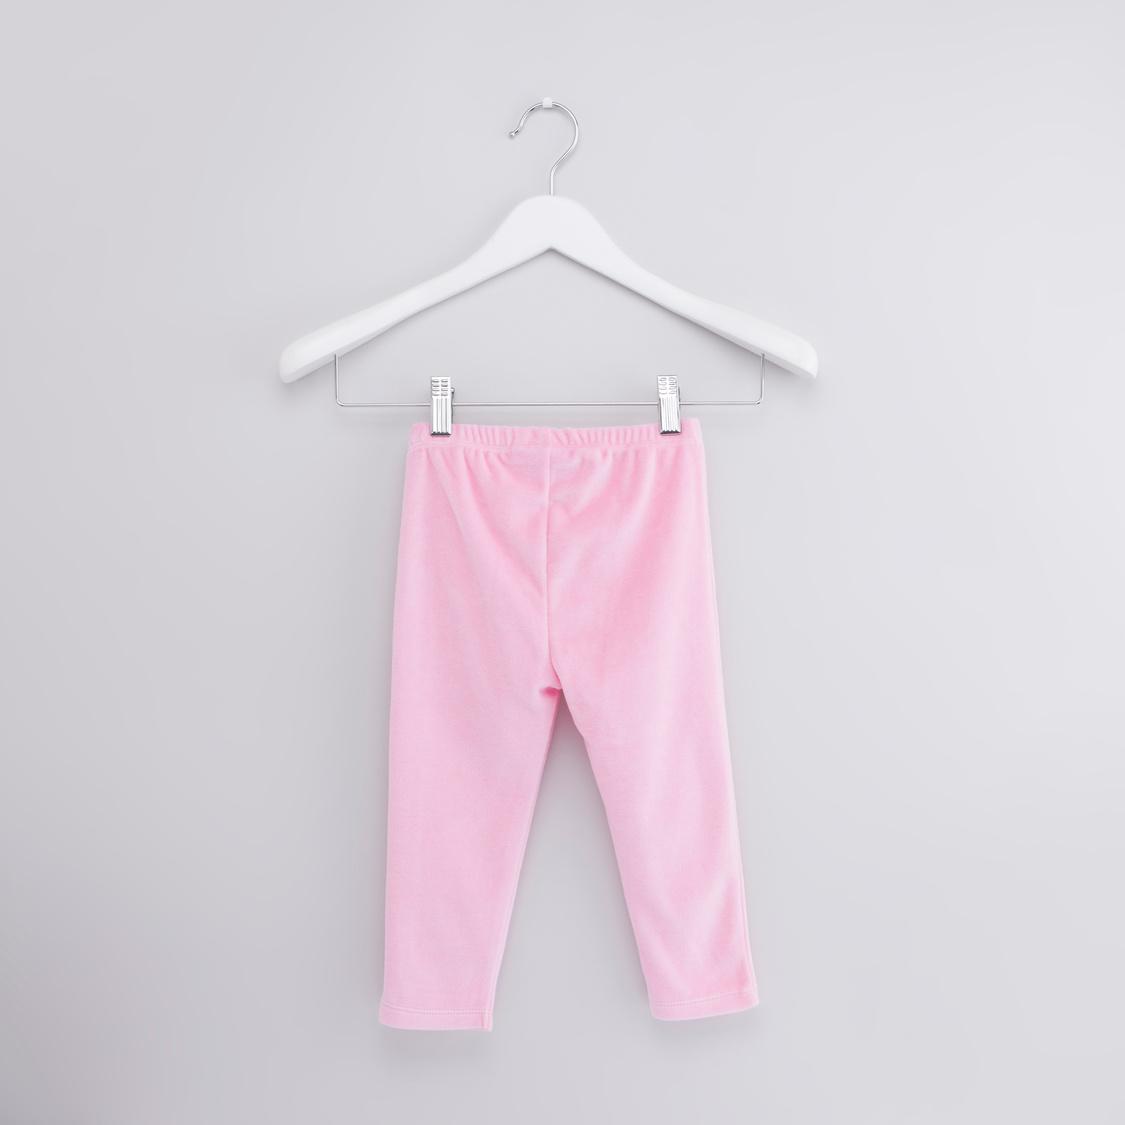 Hello Kitty Printed Long Sleeves T-shirt with Full Length Pyjamas